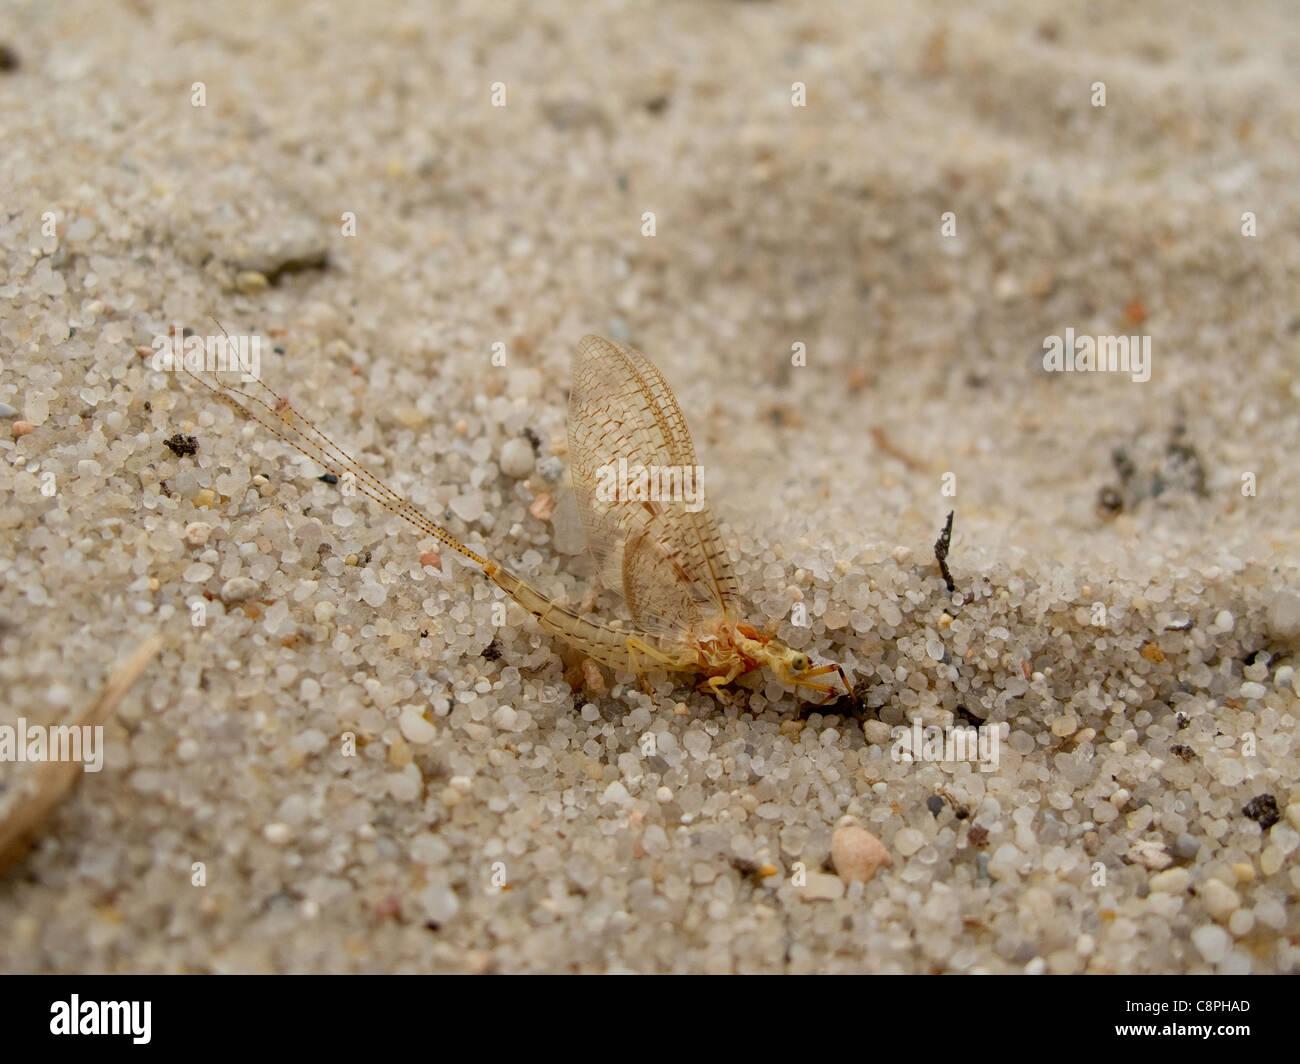 Male of an adult mayfly, Ephemera vulgata, sitting on sand - Stock Image